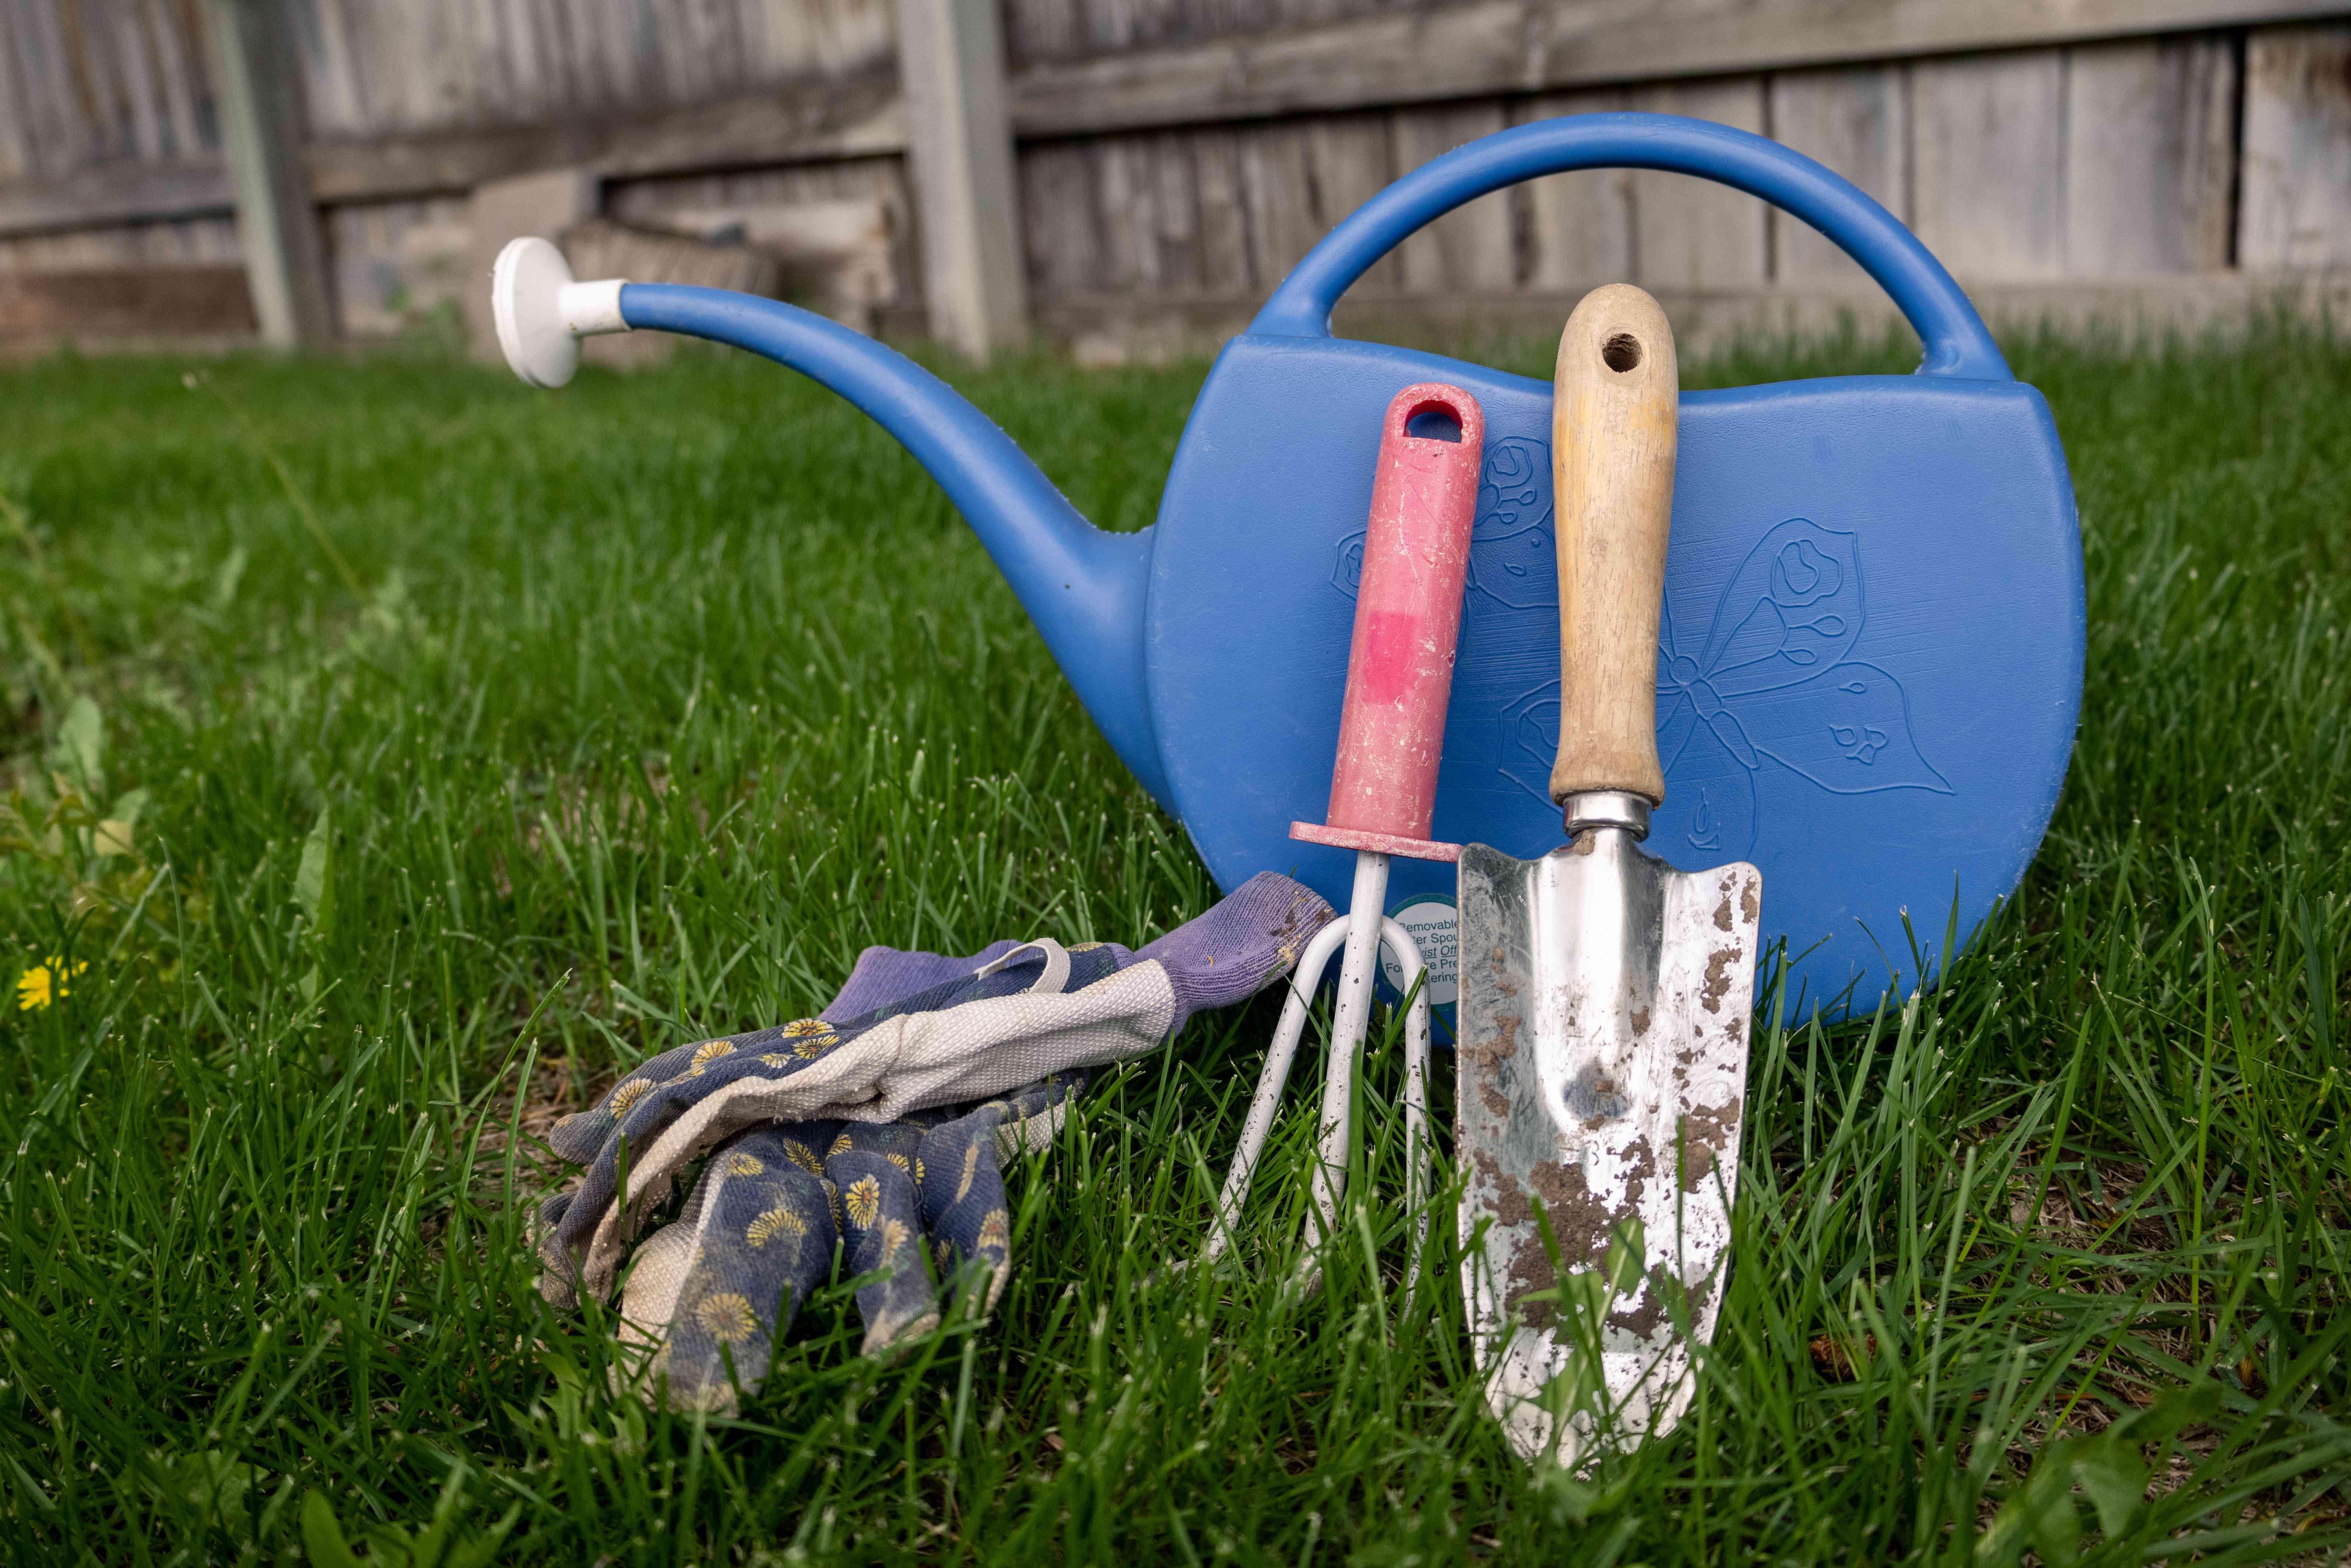 variety of gardening tools in backyard: watering can, gloves, trowel, trough